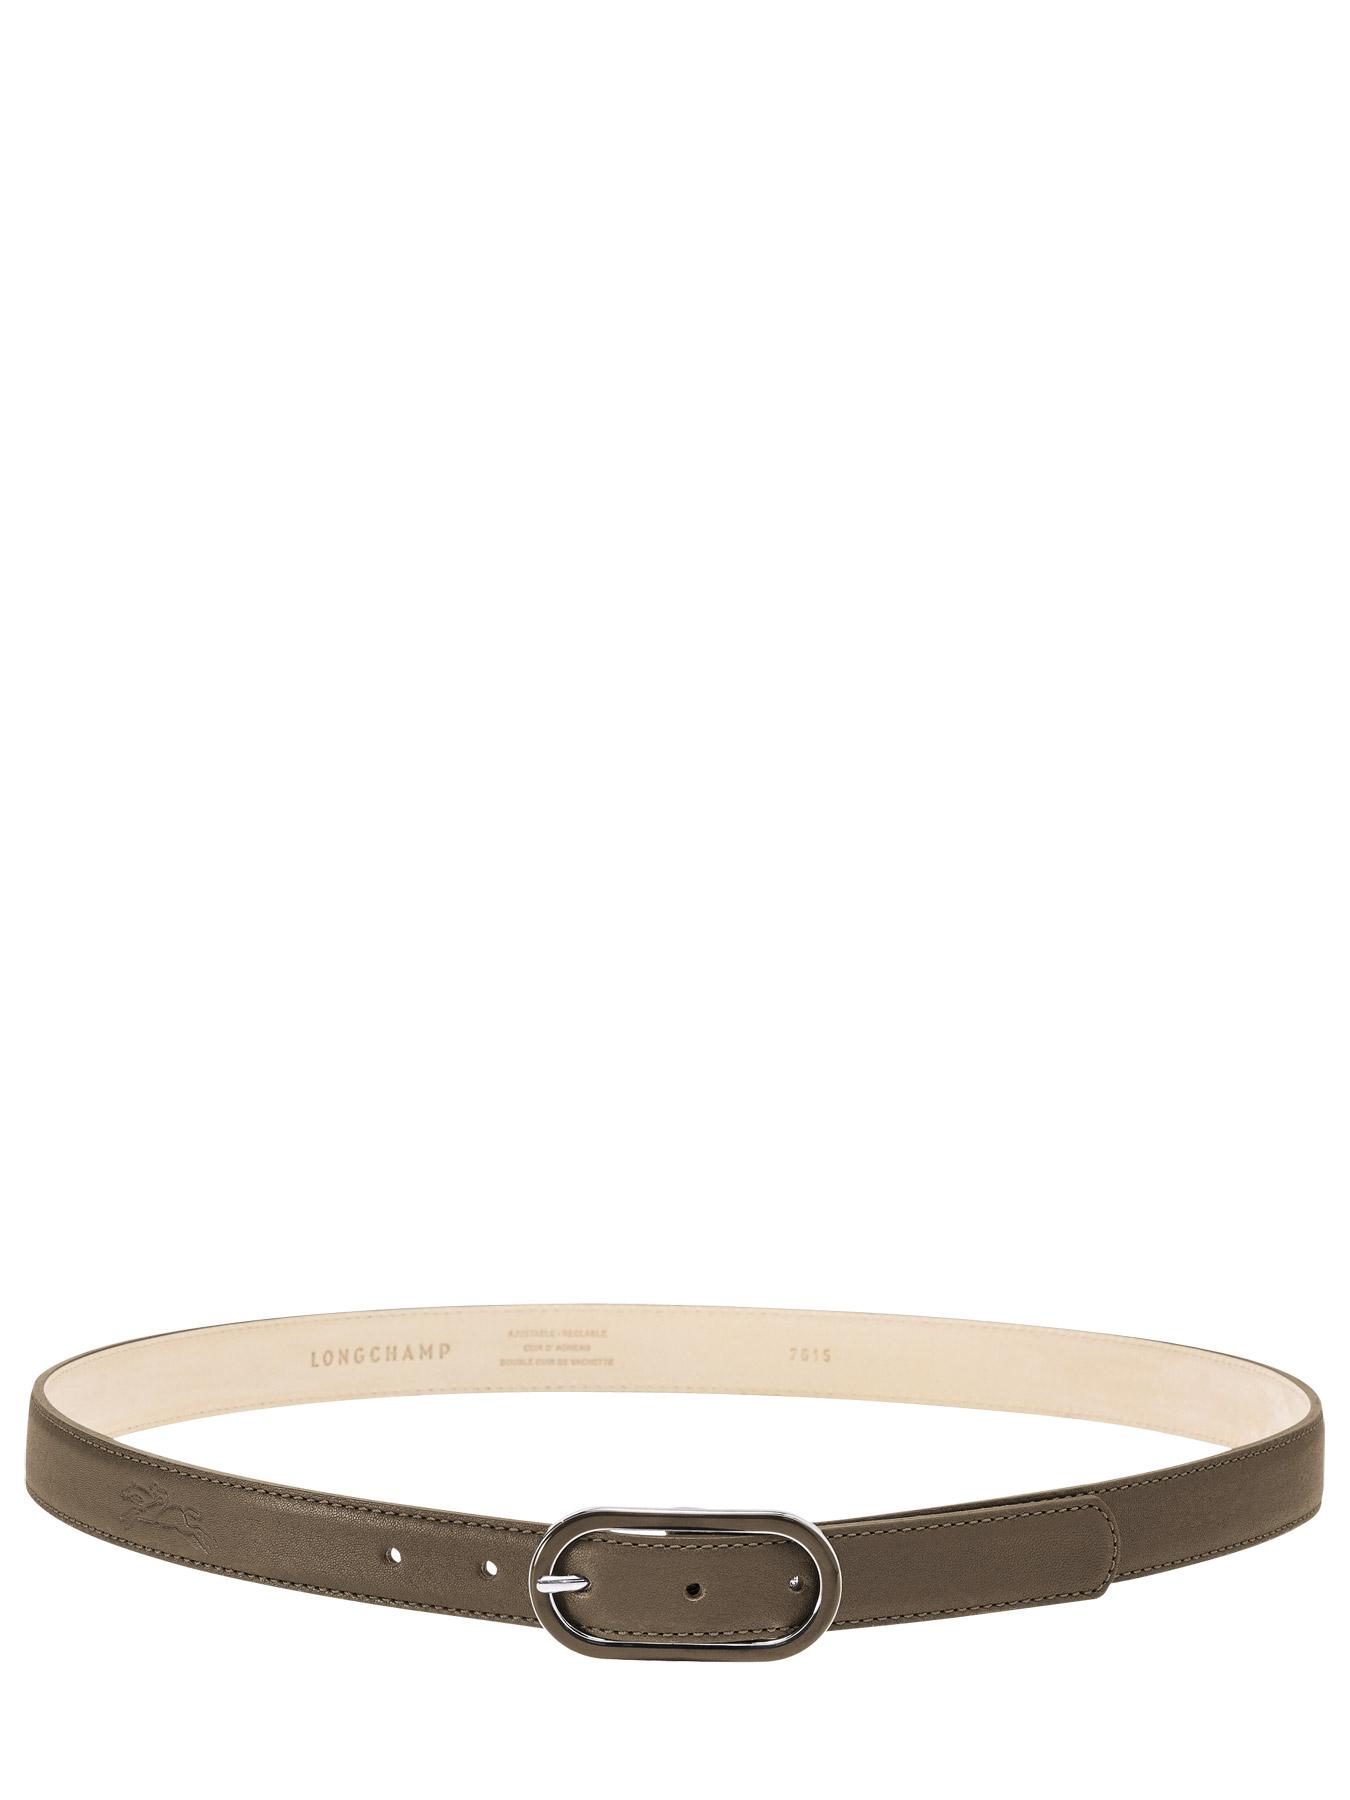 c66ba78724b0 Longchamp Belts 7615737 - free shipping available